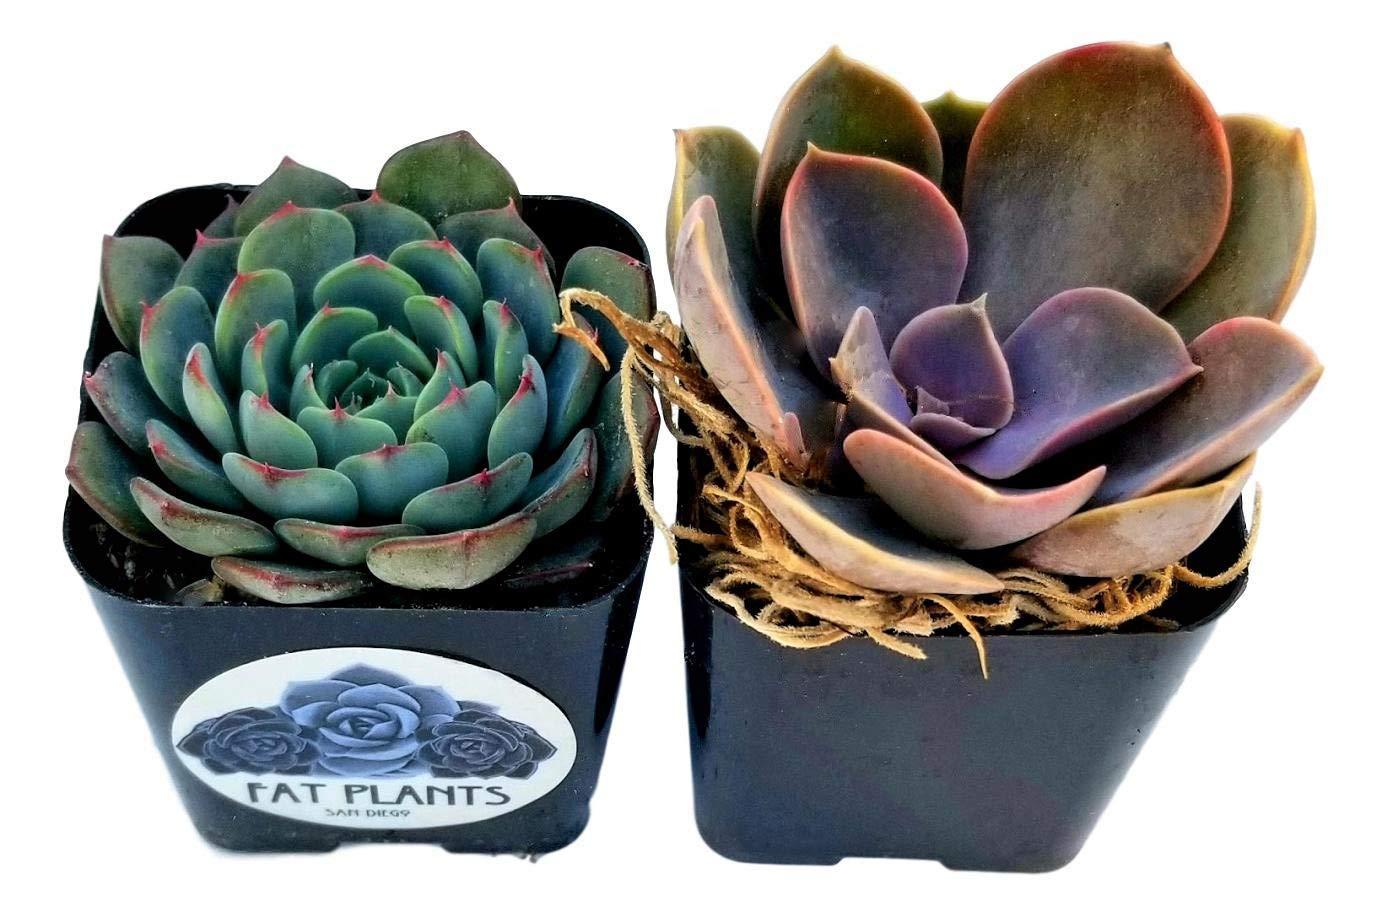 Fat Plants San Diego All Rosette Succulent Plants in 2 Inch Pots (2)